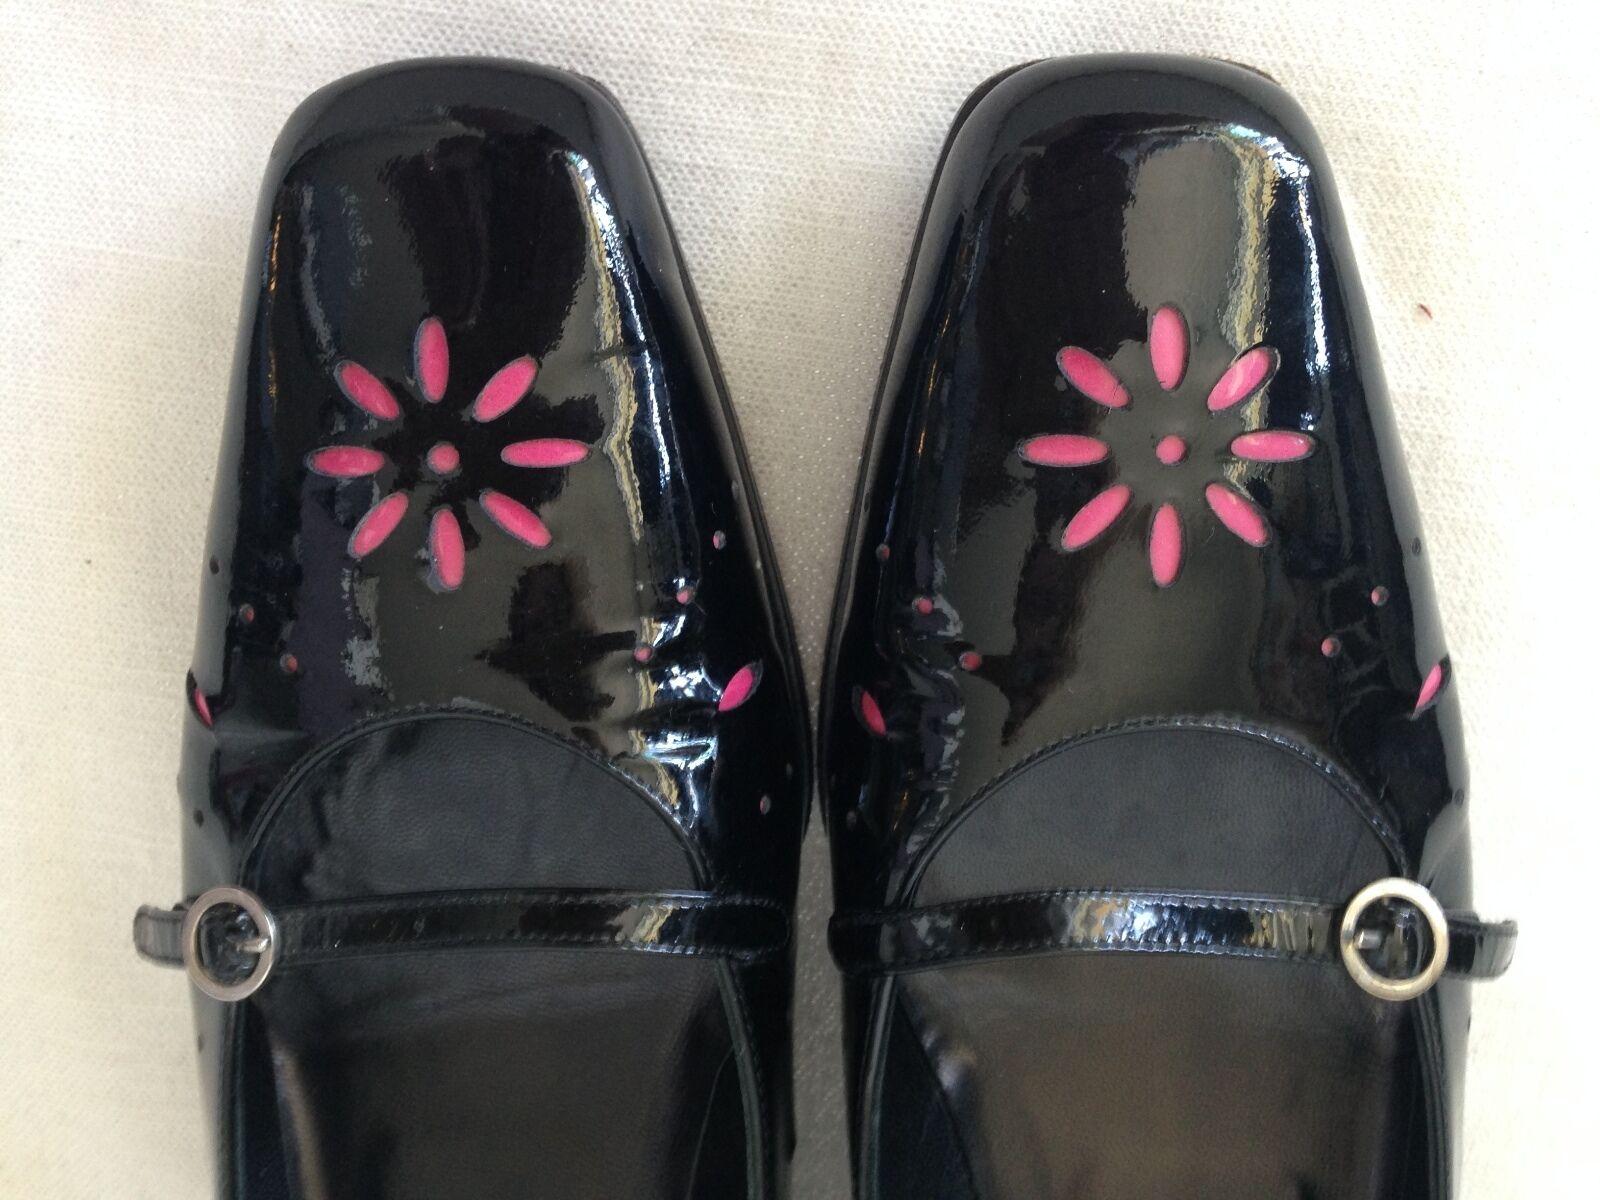 MACARENA Espadrillas da Donna Naya 3-Am Rosa (Rosa (Rosa Rosa Serraje) 7 UK 911832